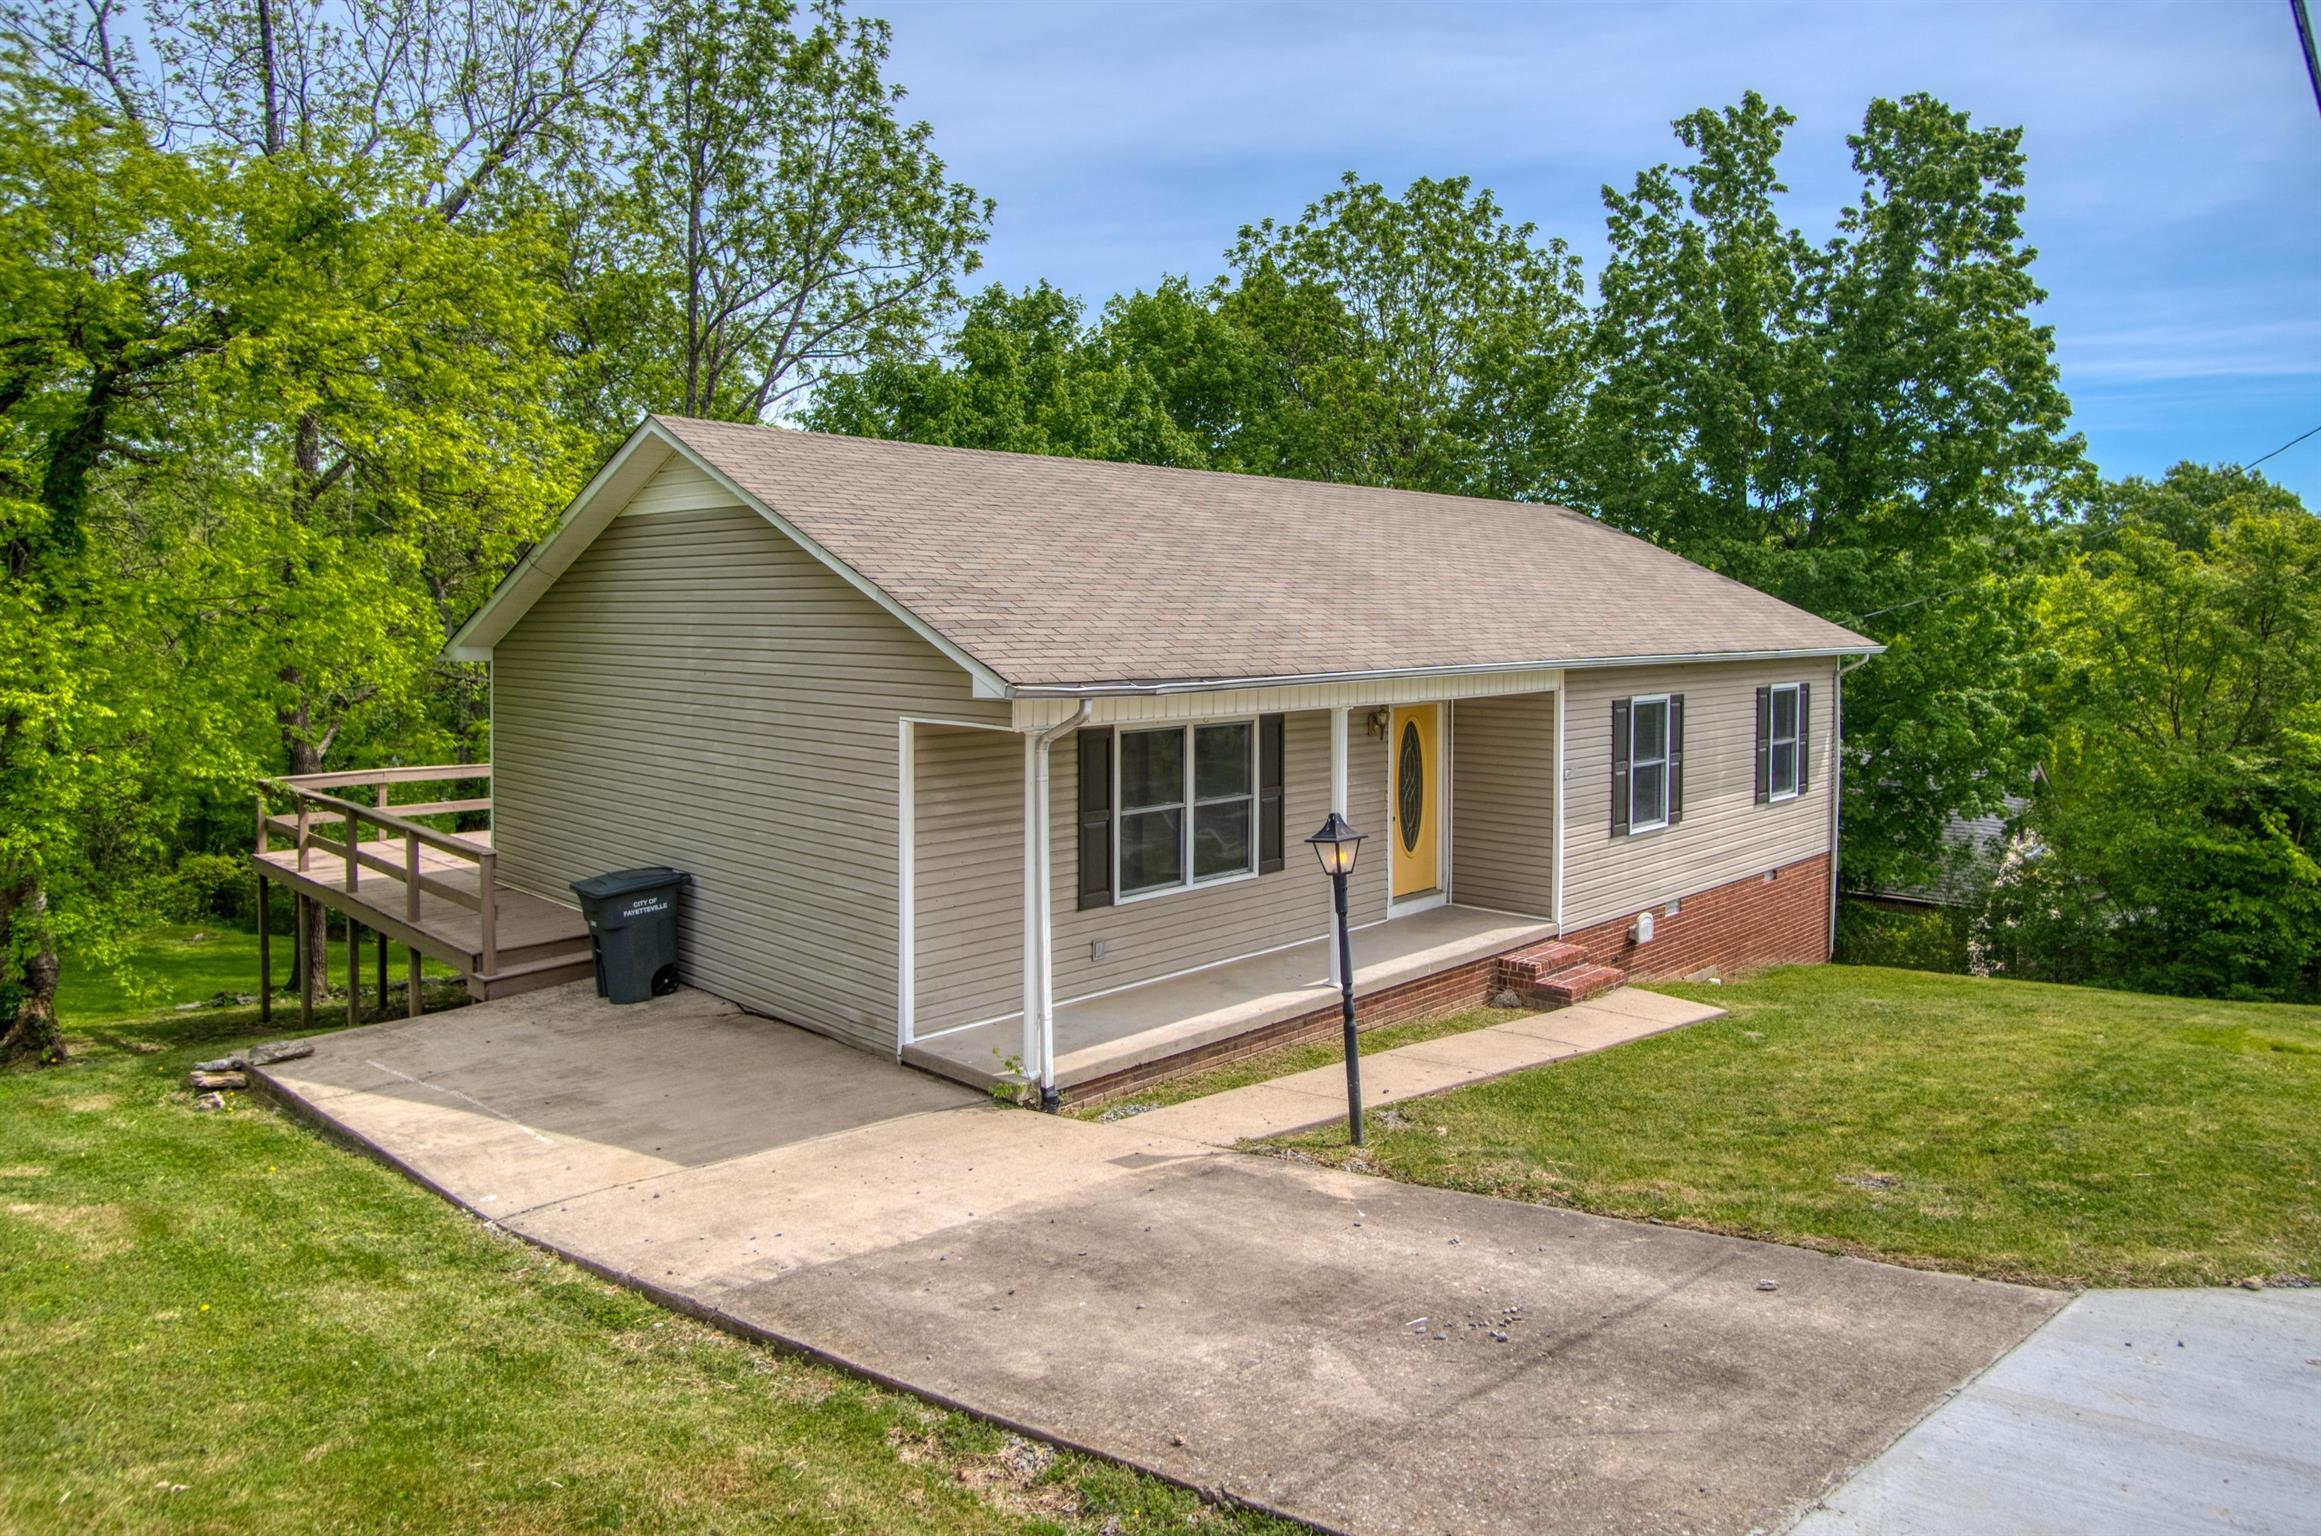 501 Hillview Blvd, Fayetteville, TN 37334 - Fayetteville, TN real estate listing